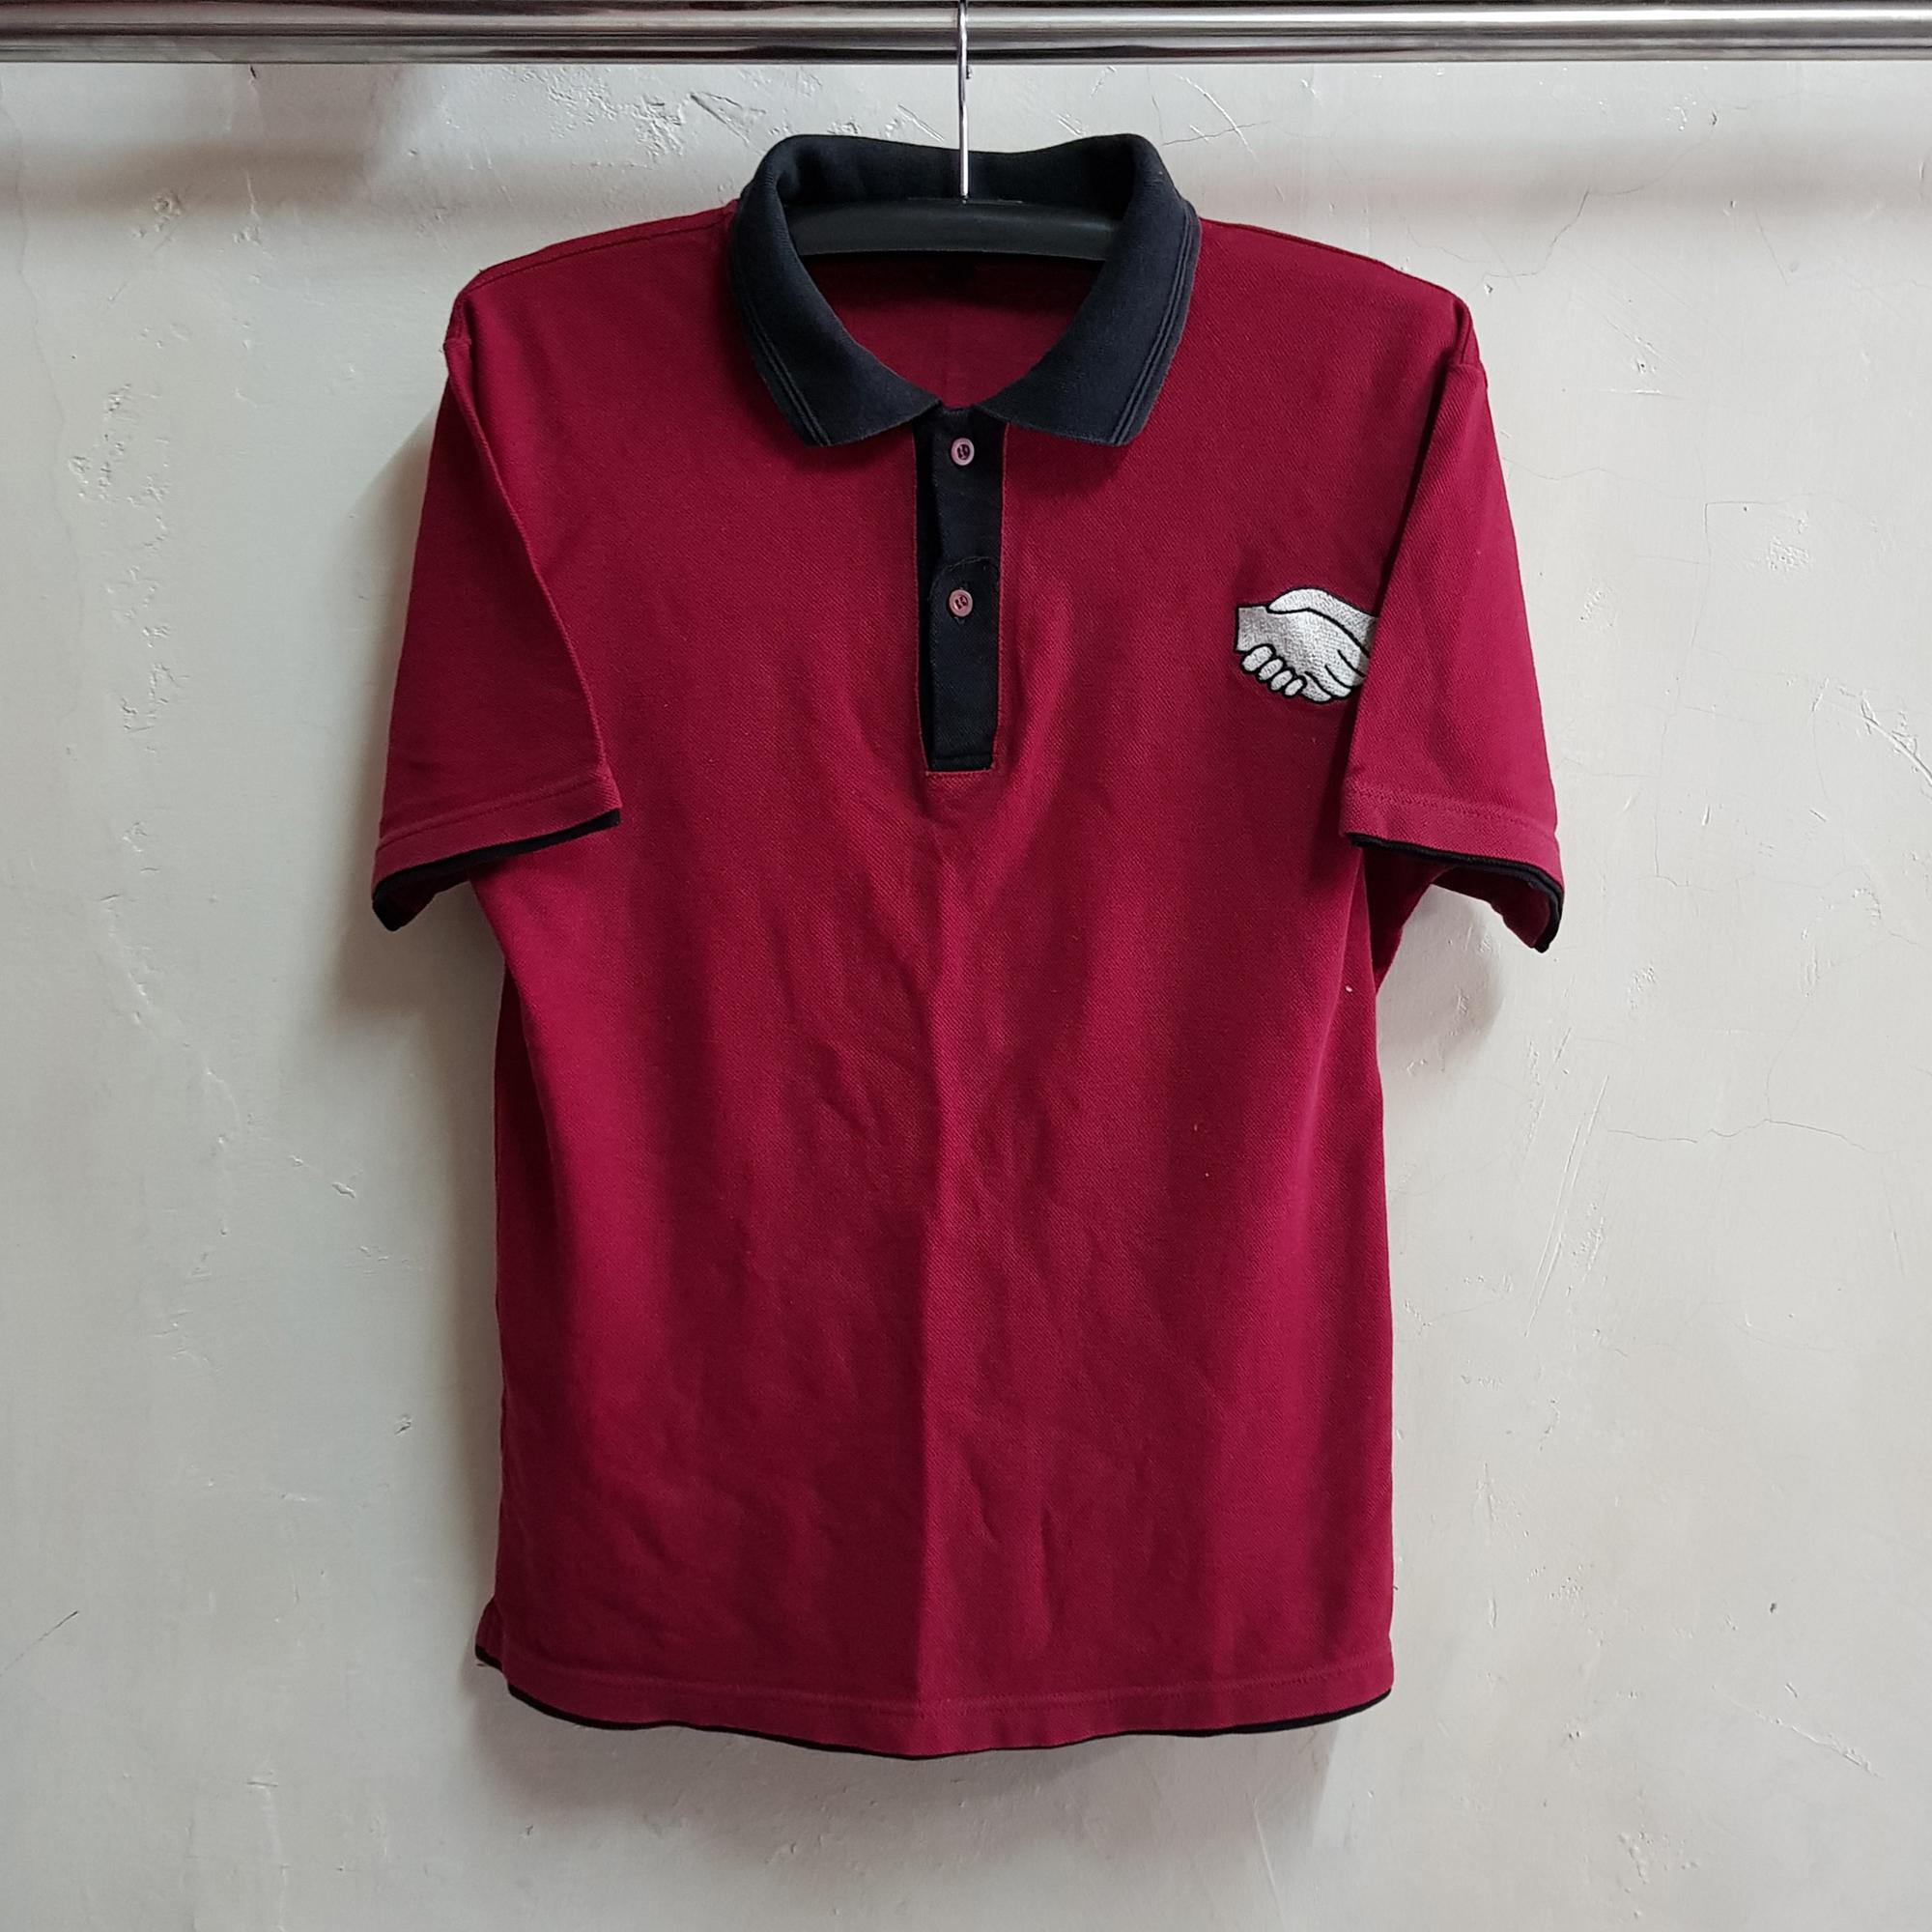 Seragam Poloshirt Lacoste Cotton, Bulakamba